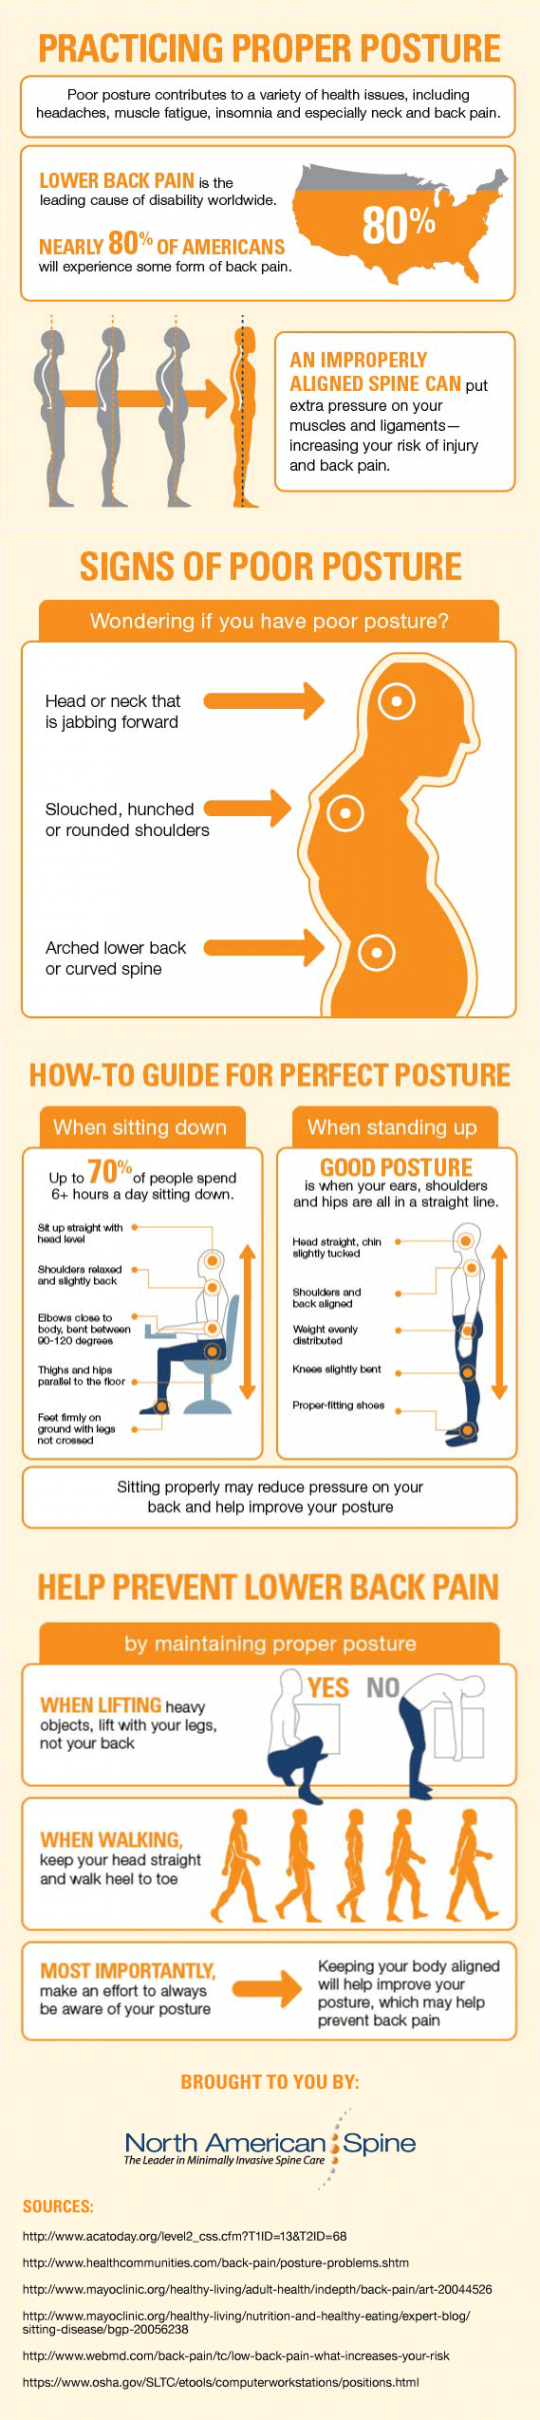 Practicing Proper Posture